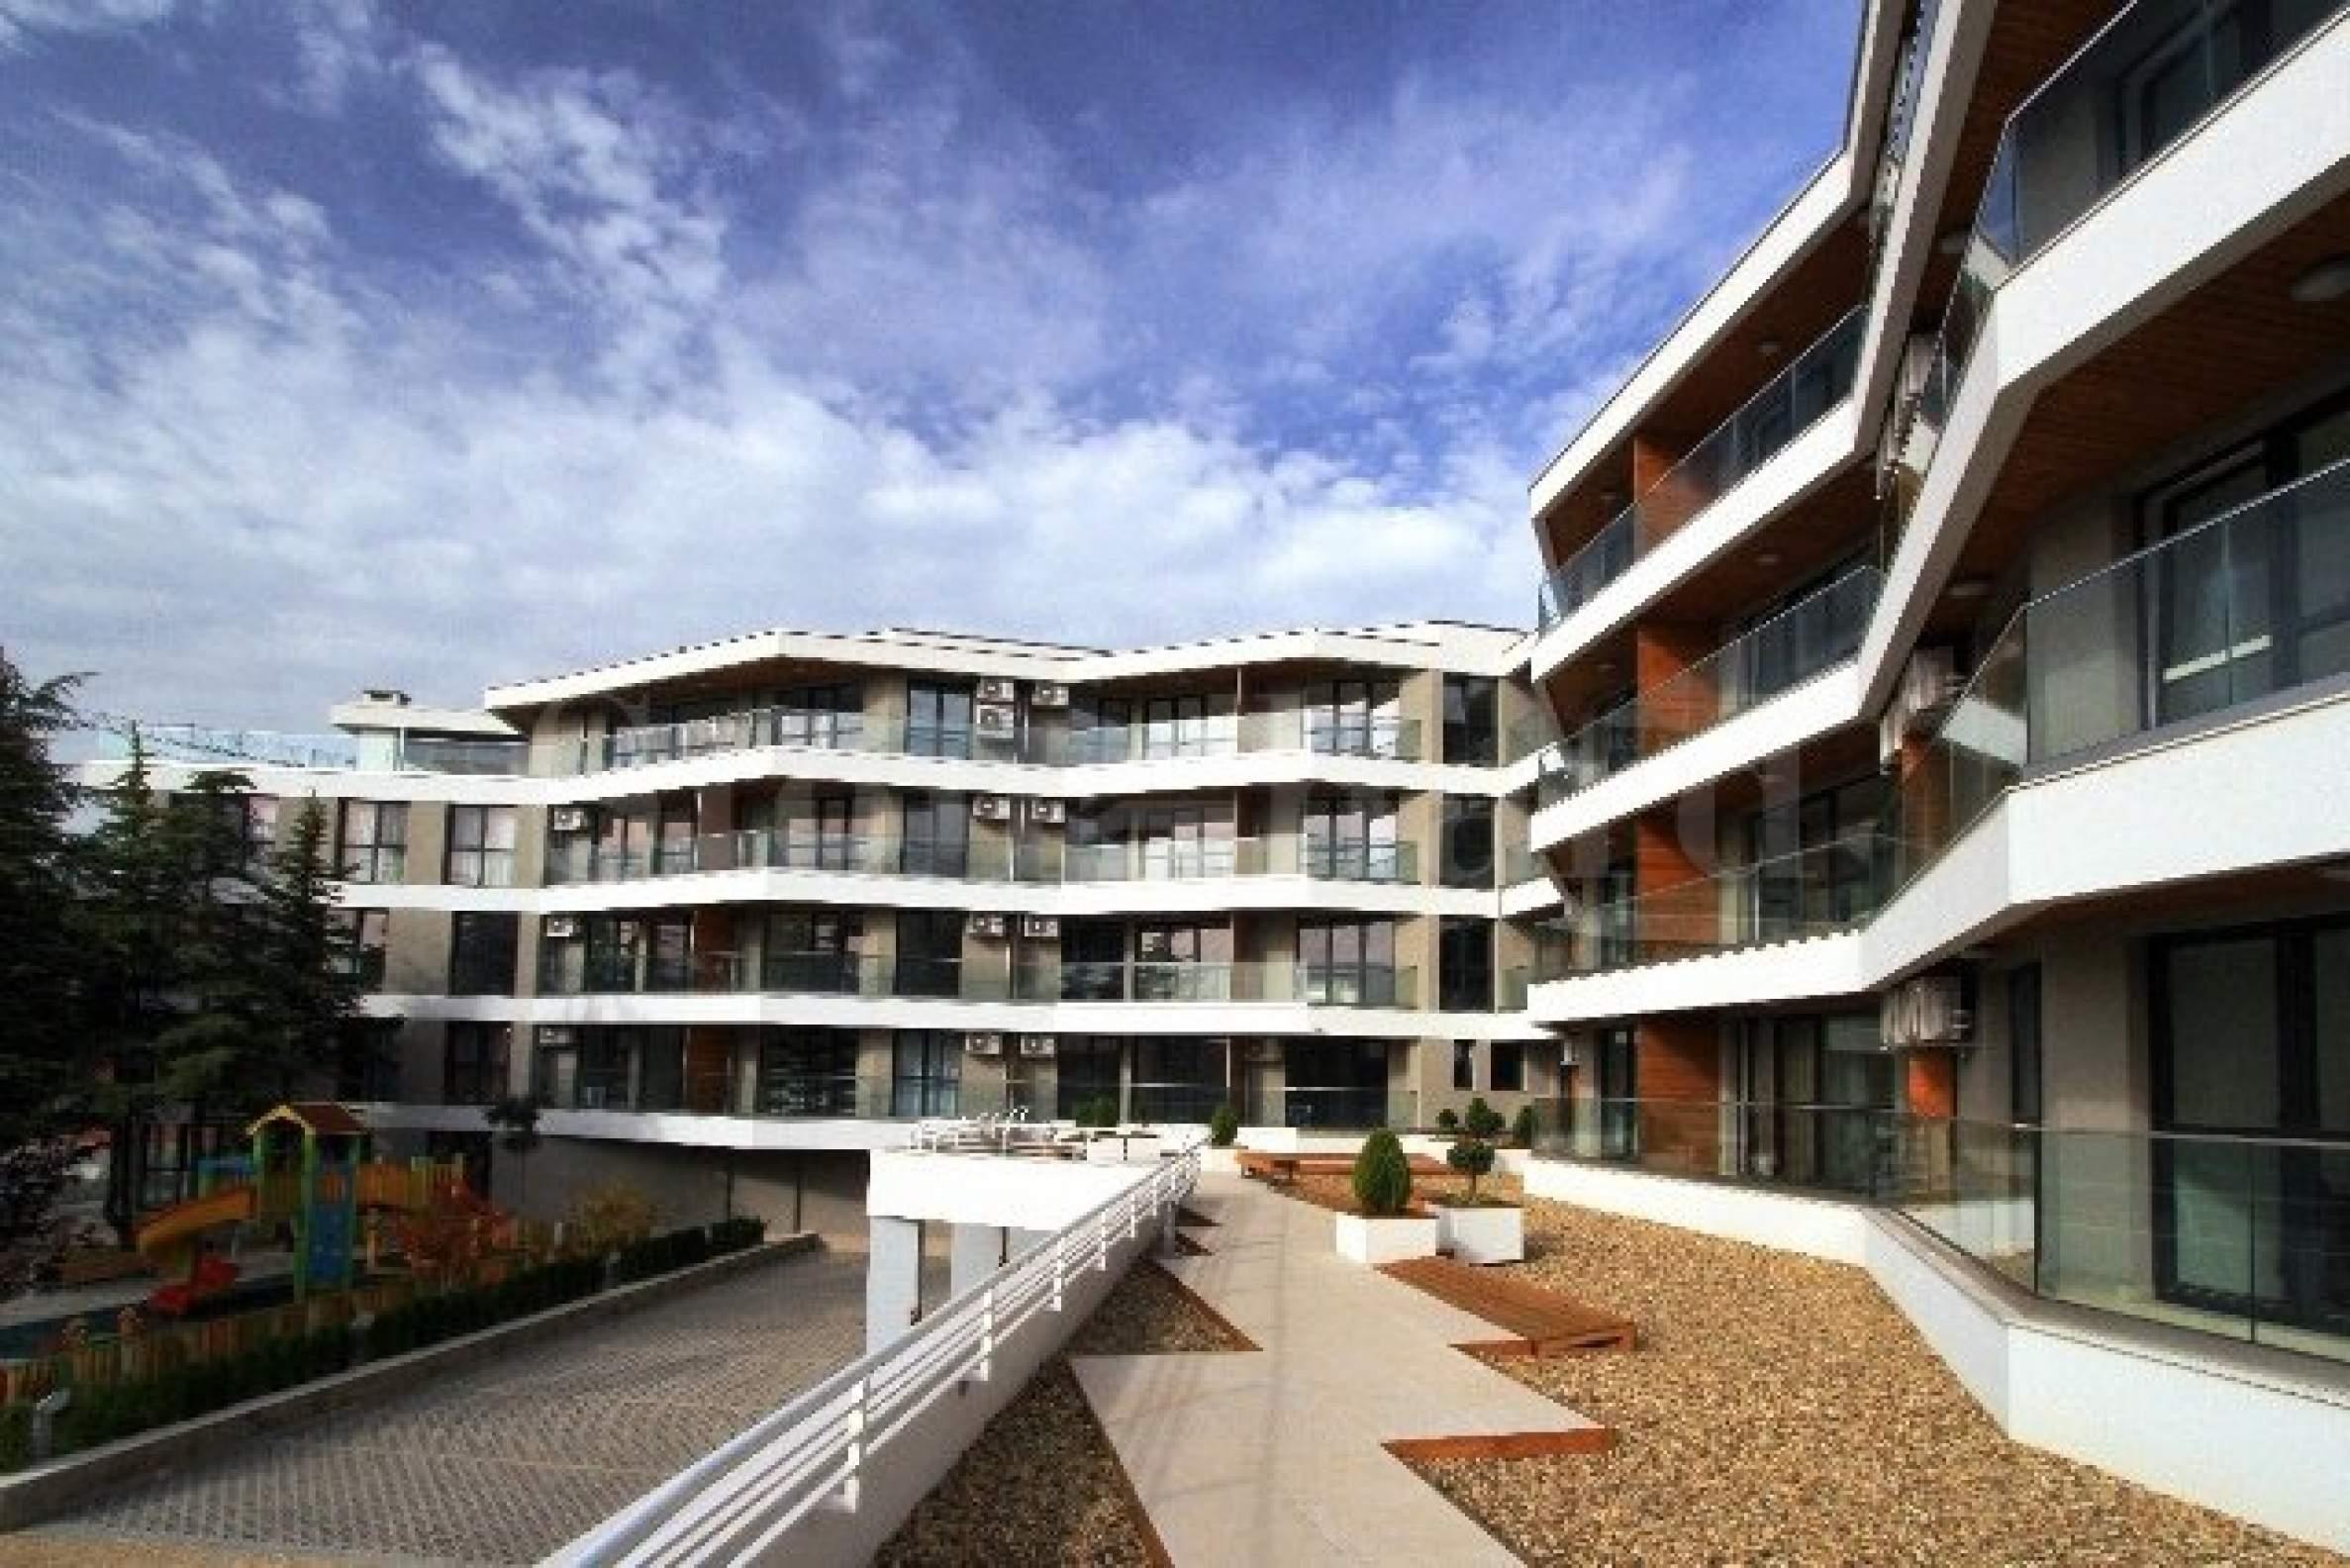 Apartments in new building in Briz district2 - Stonehard